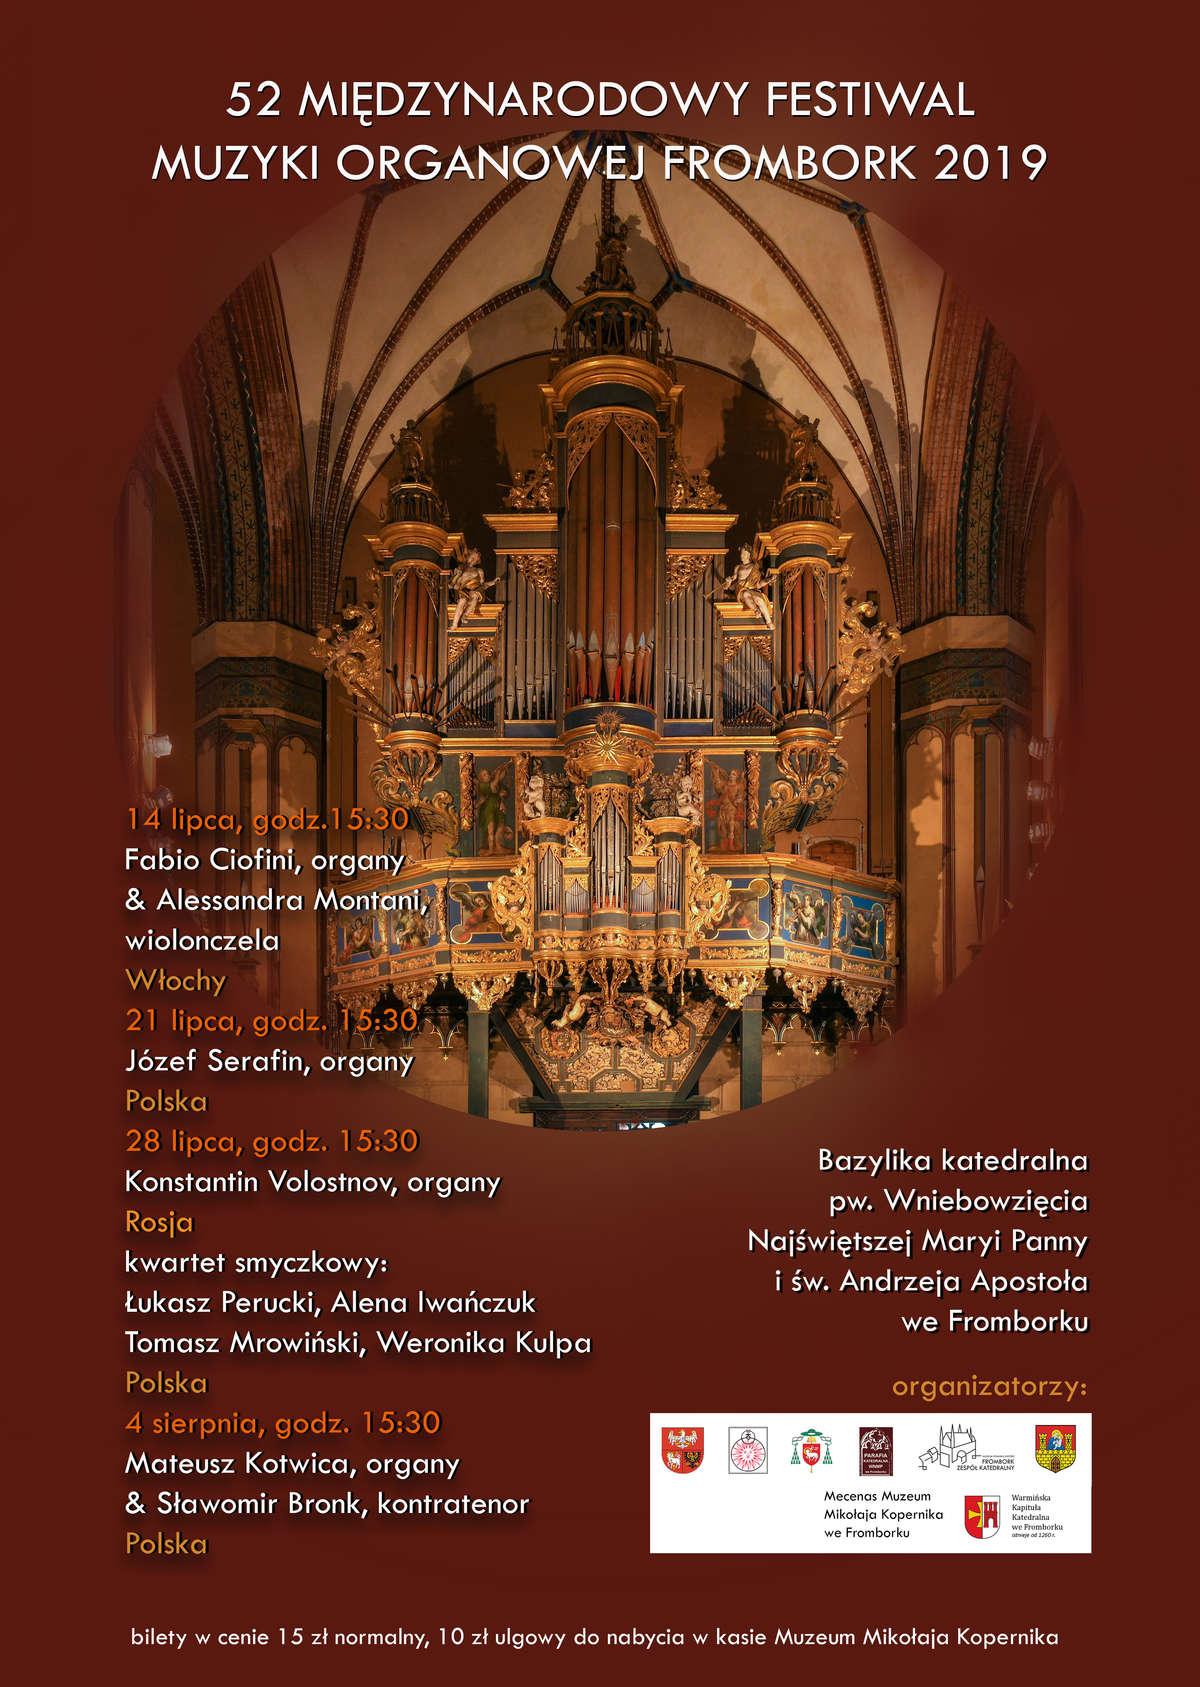 koncerty fromborskie 2019  - full image